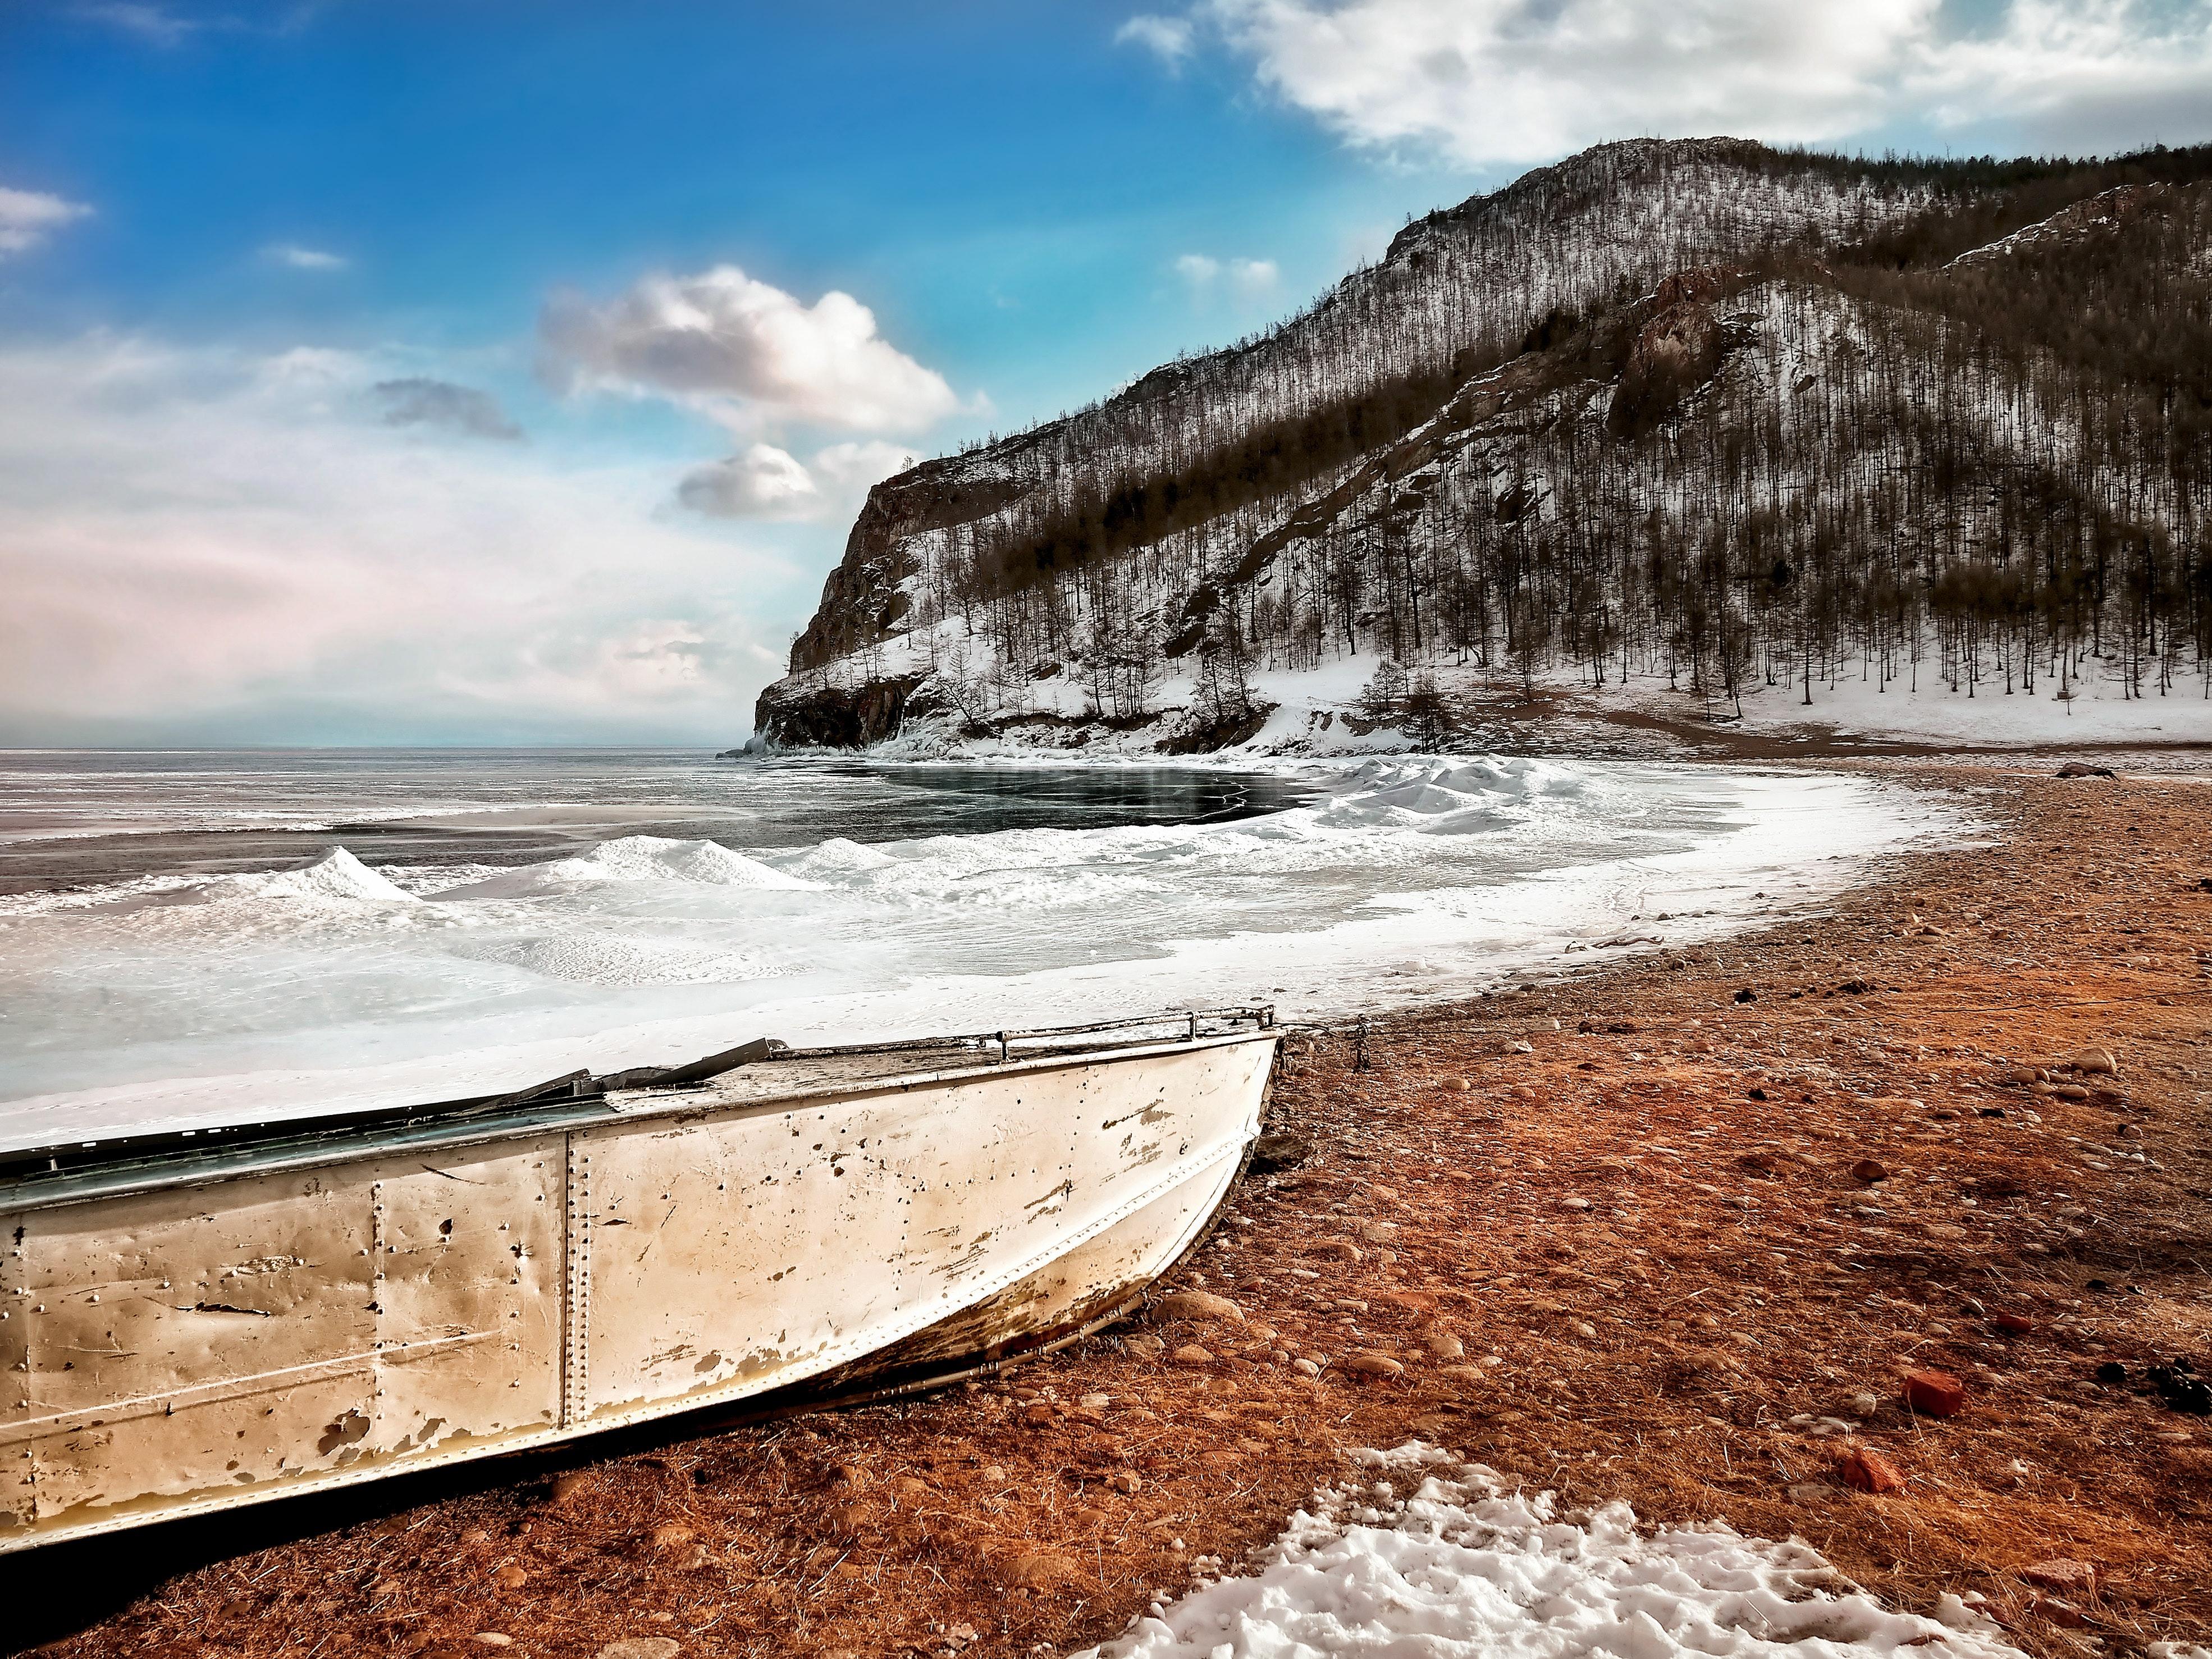 White Boat on Seashore Near Mountain Under White and Blue Sky, Barren, Sea, Winter, Waves breaking, HQ Photo